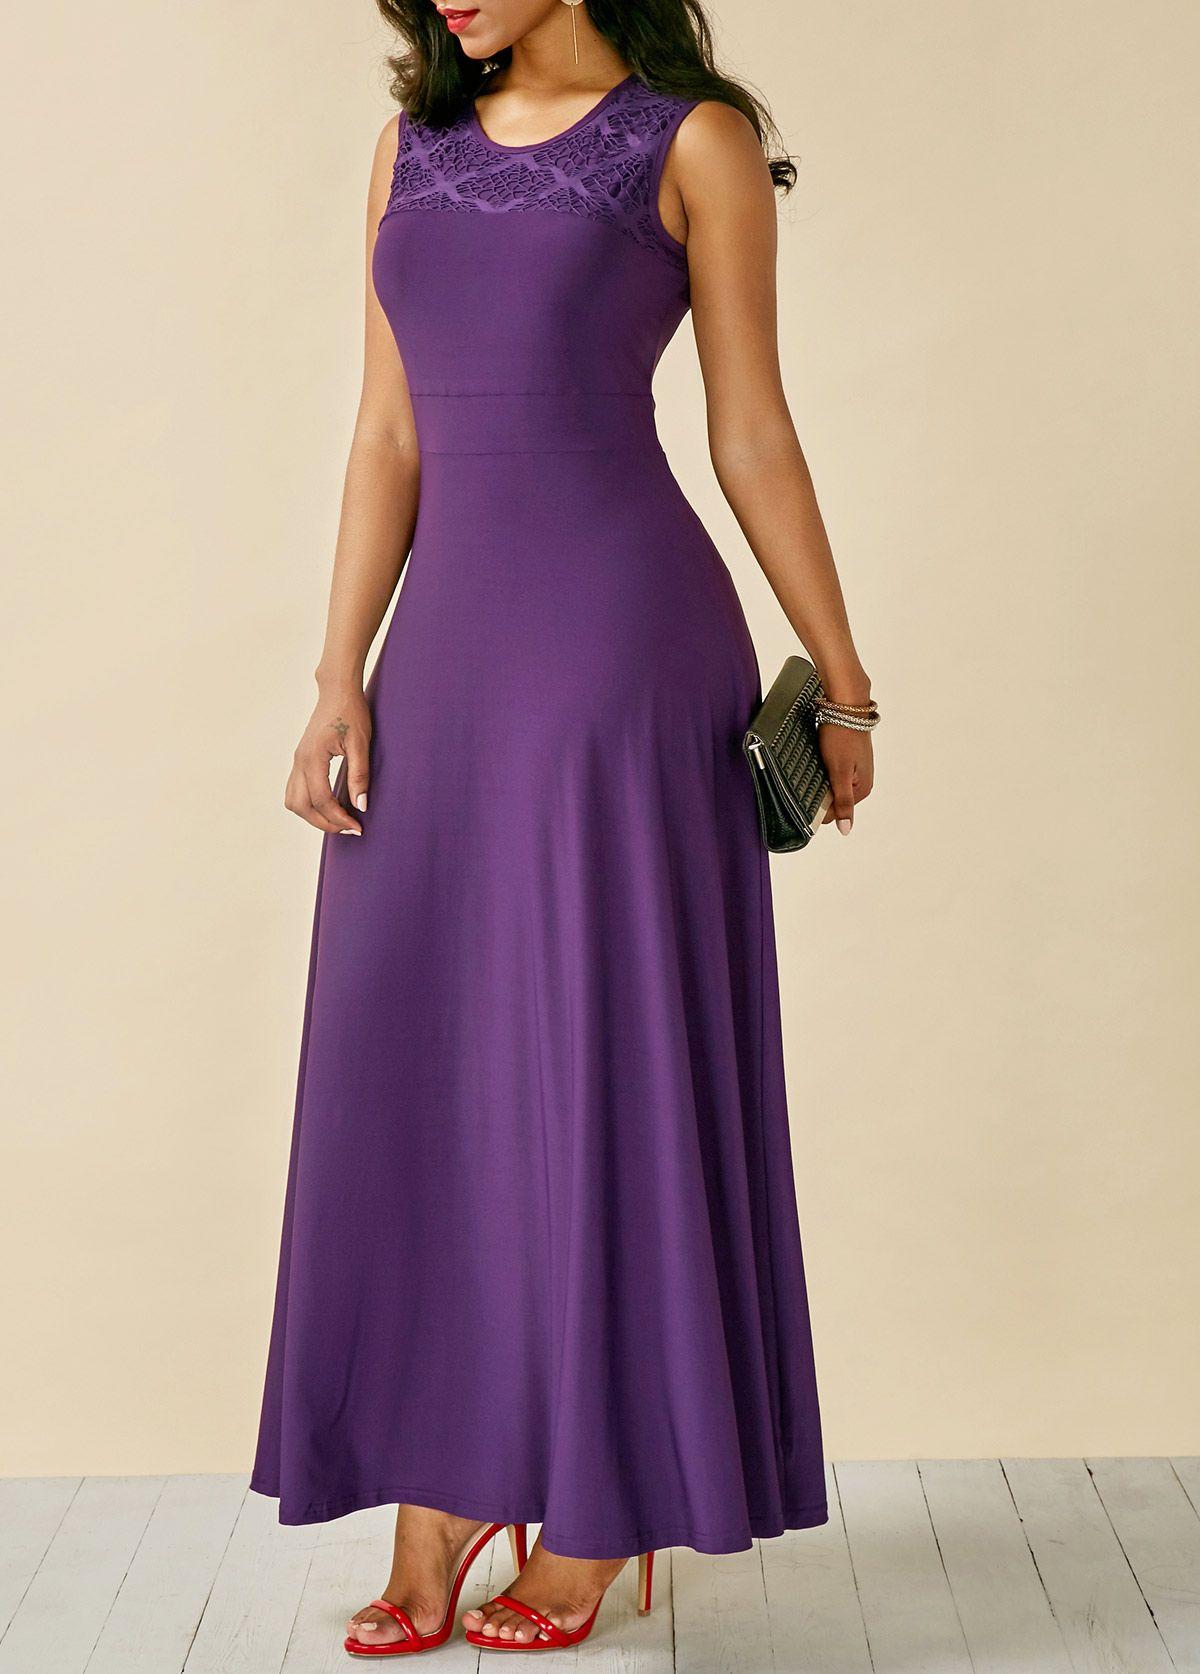 Lace panel round neck sleeveless purple maxi dress on sale